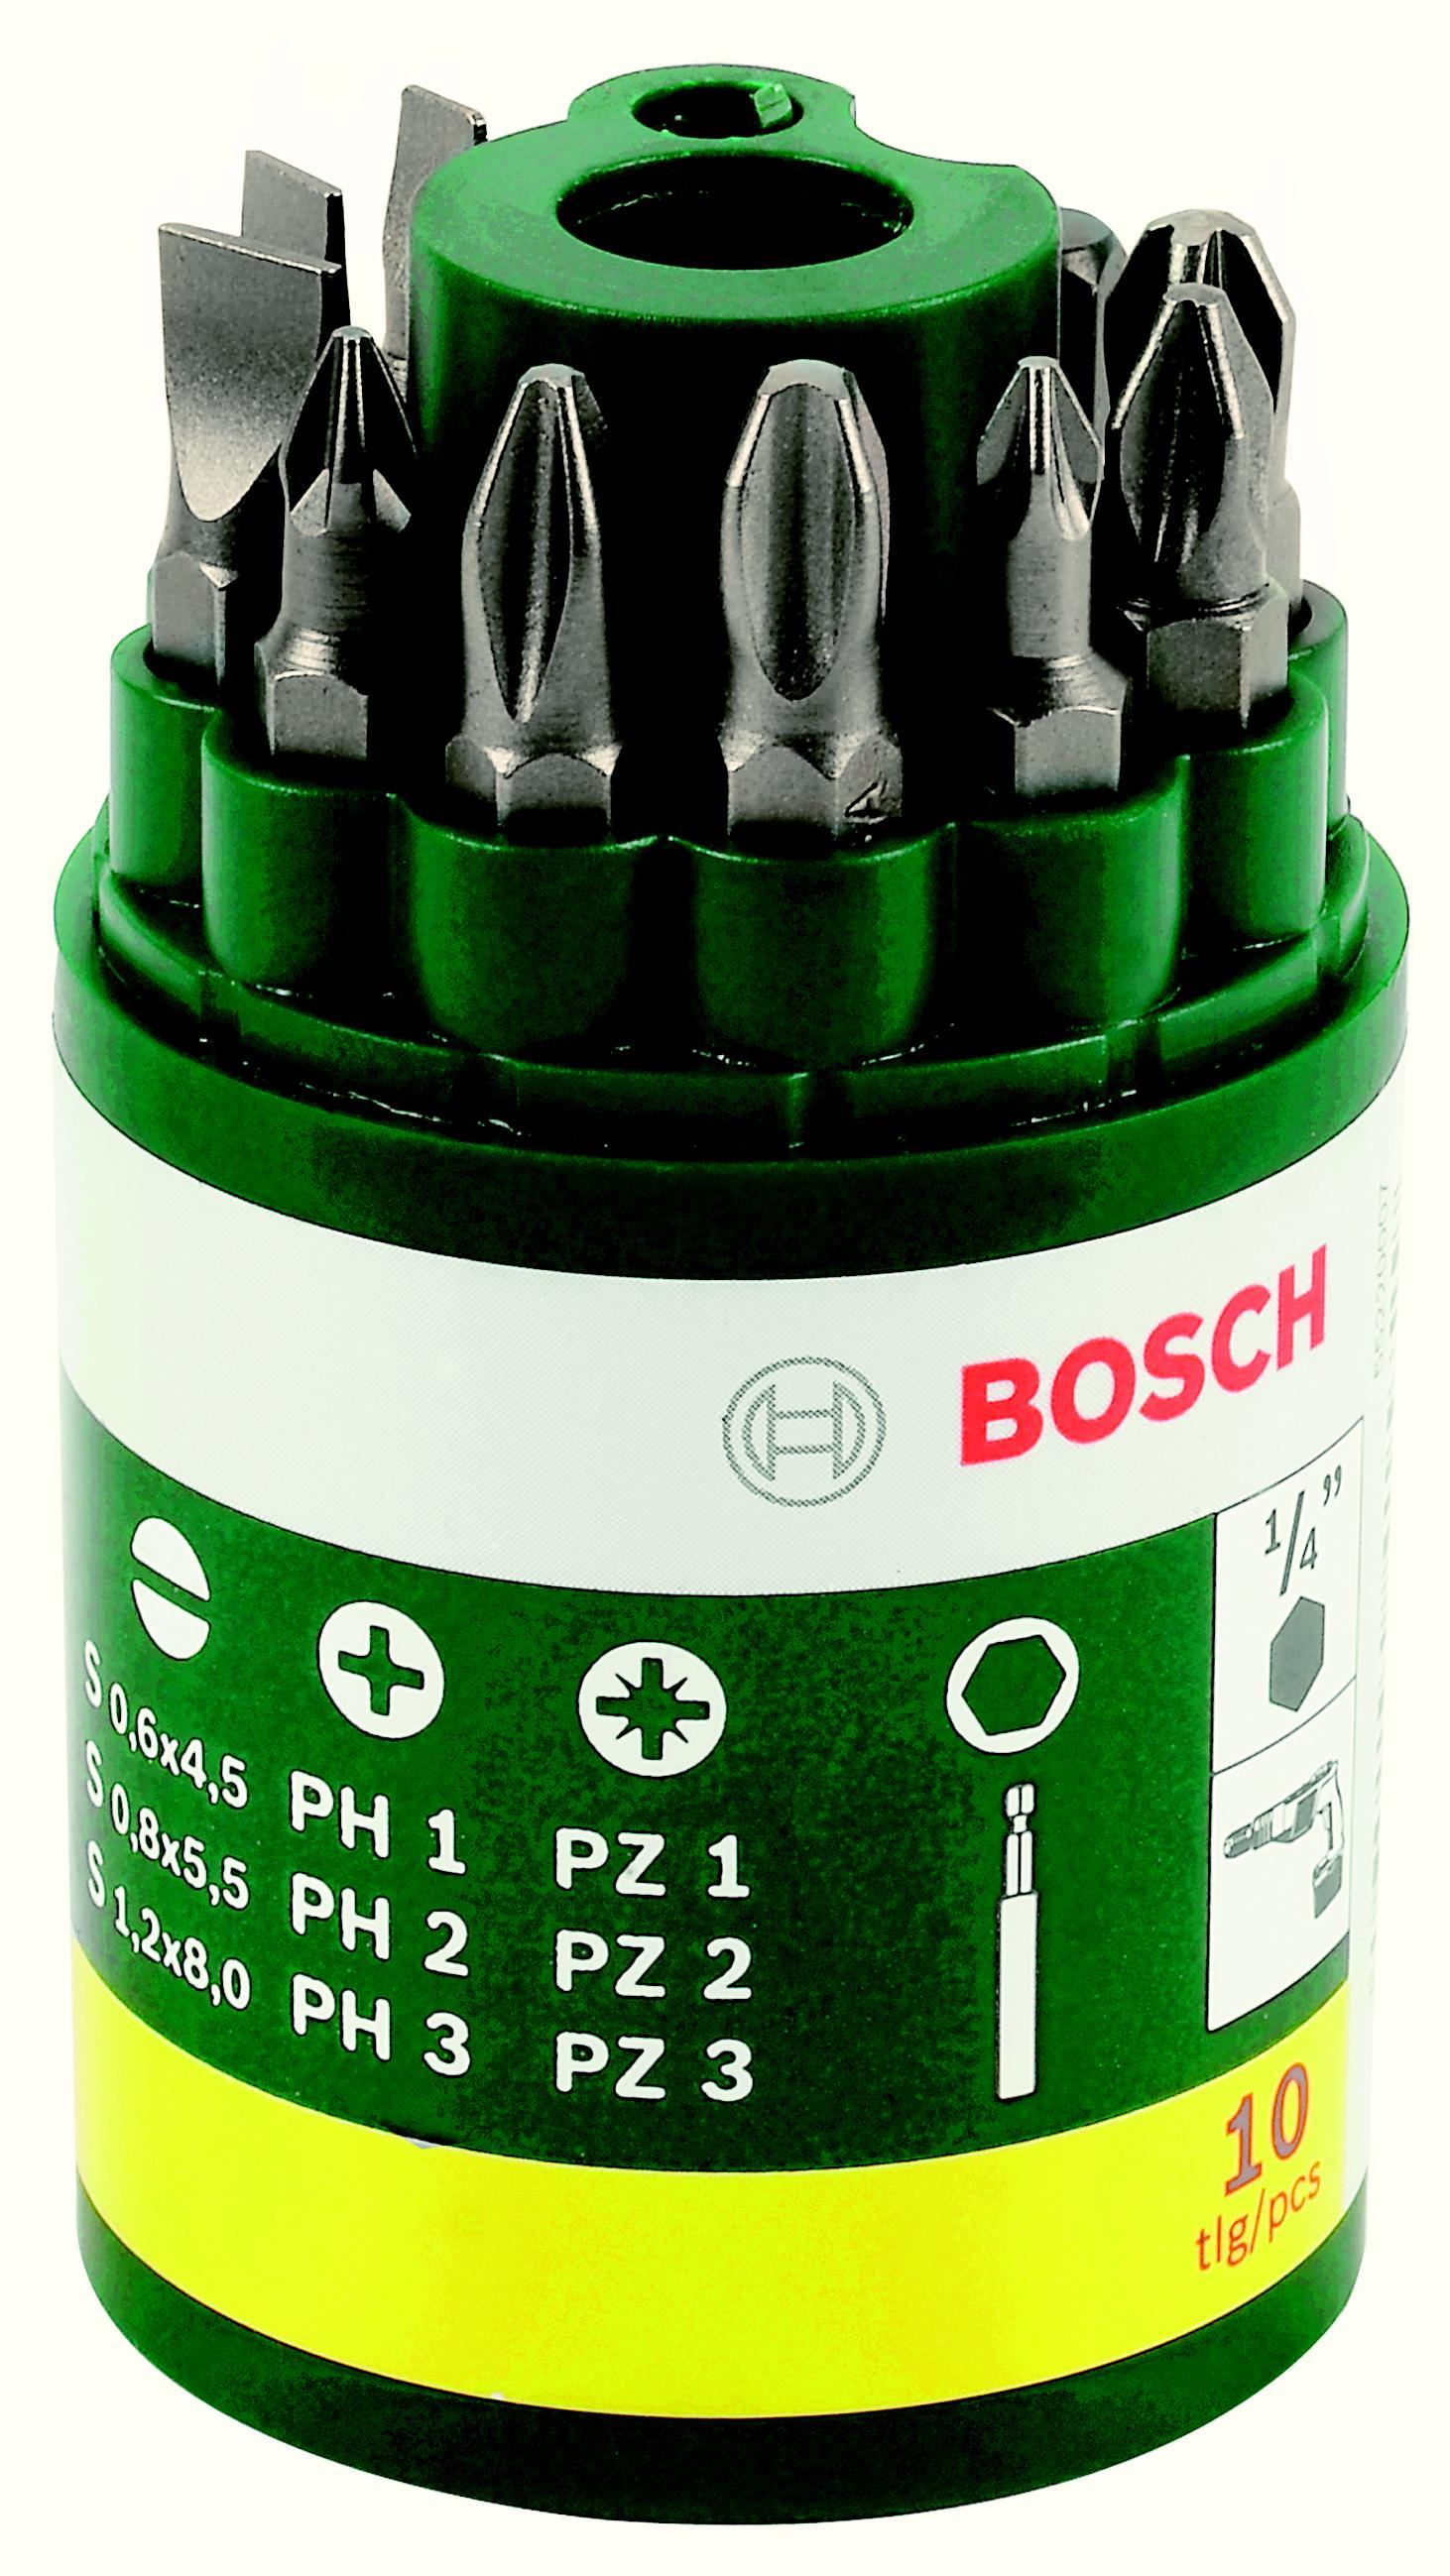 Набор бит Bosch 2607019454 набор бит bosch 2607019454